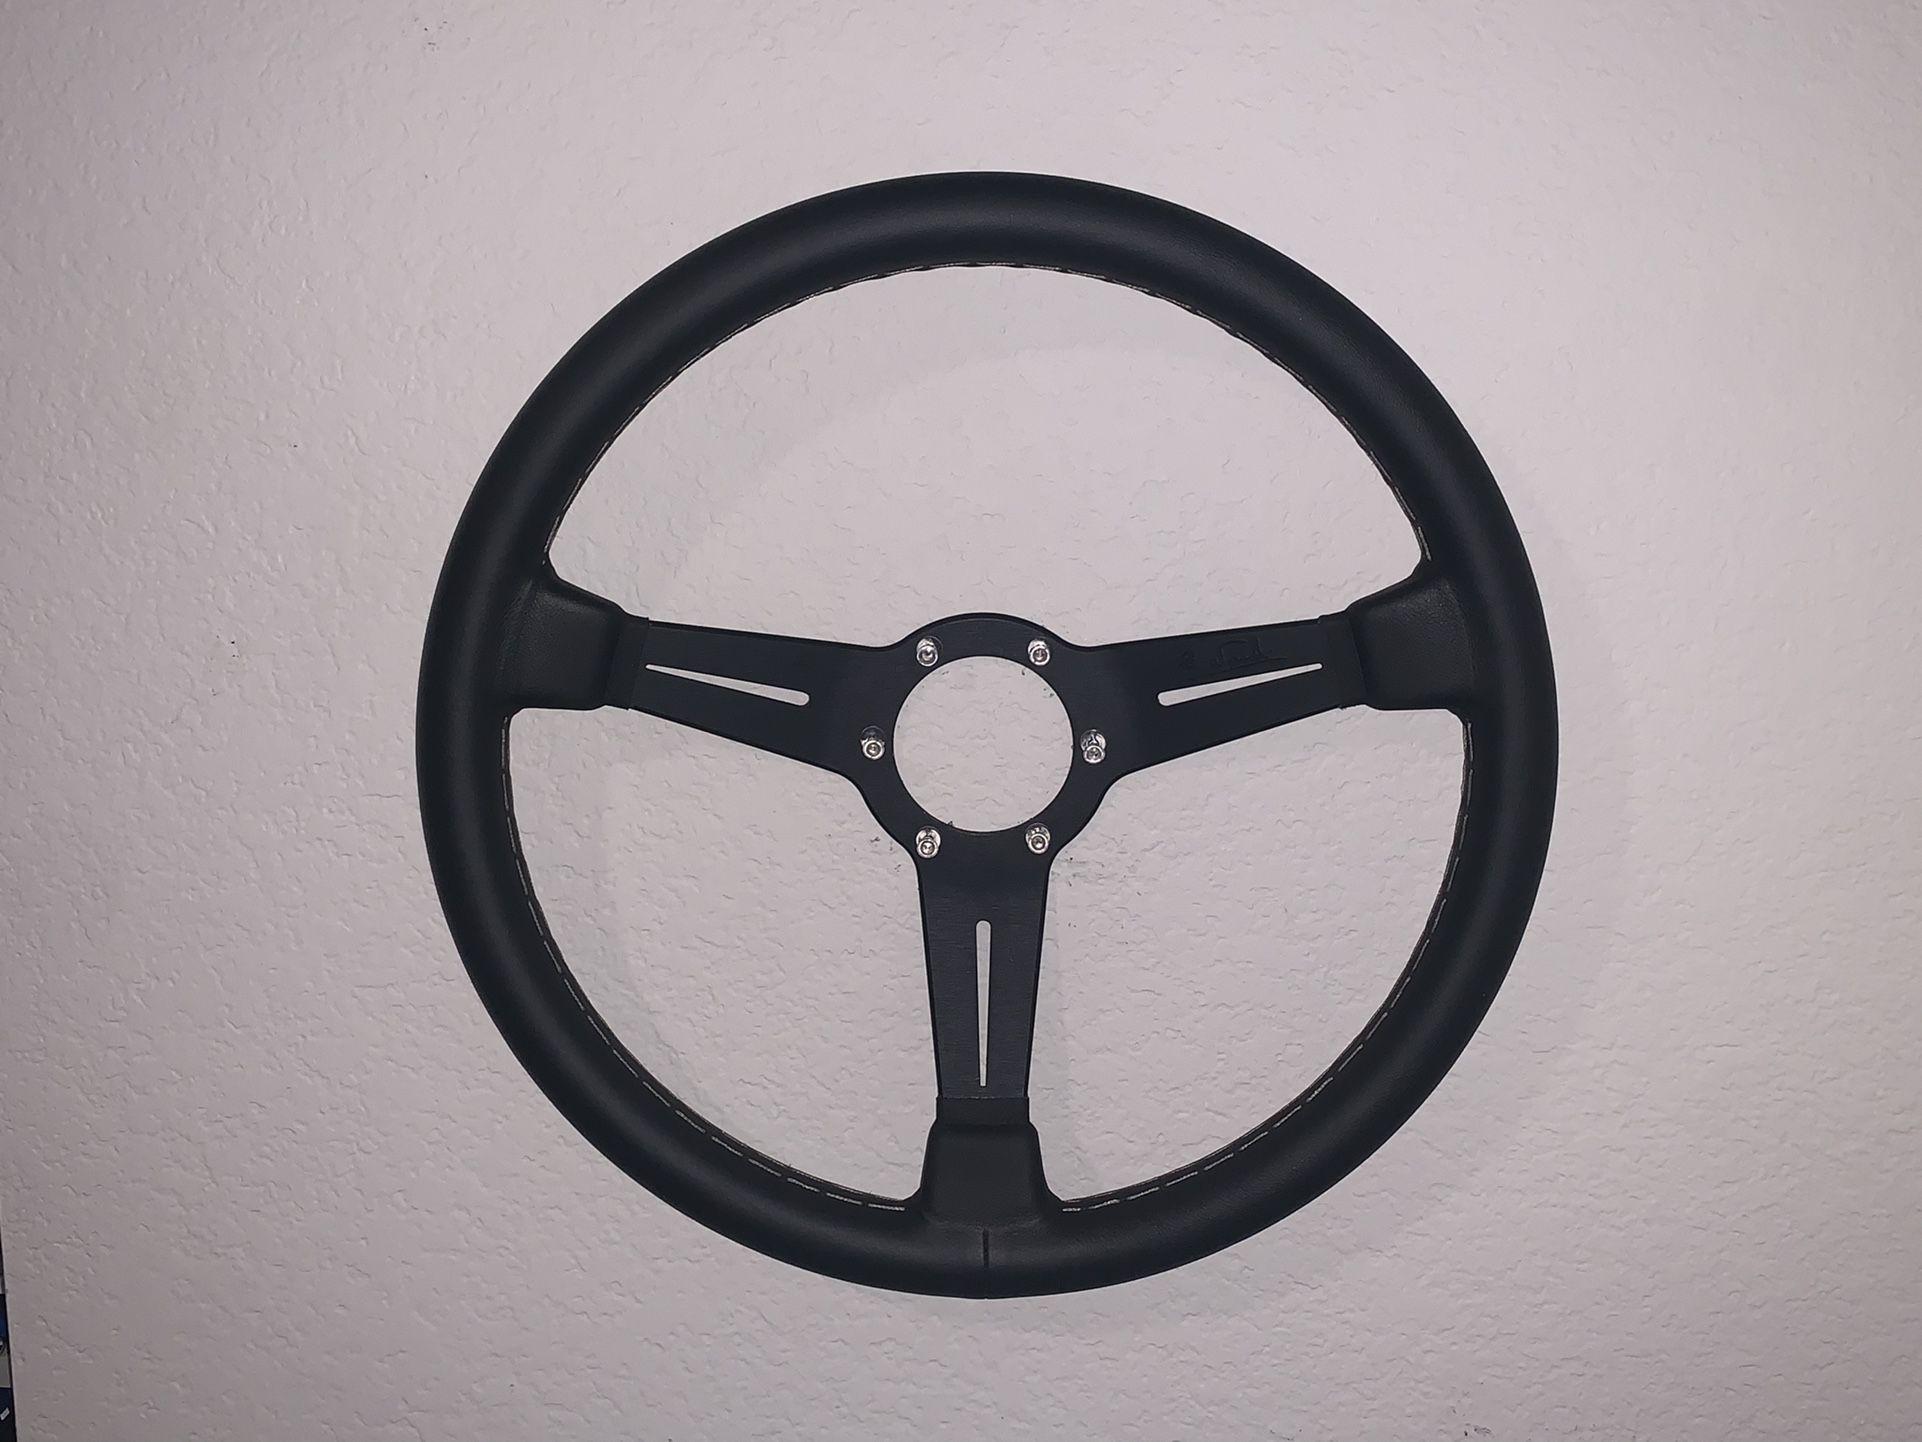 Nardi Volante Steering Wheel